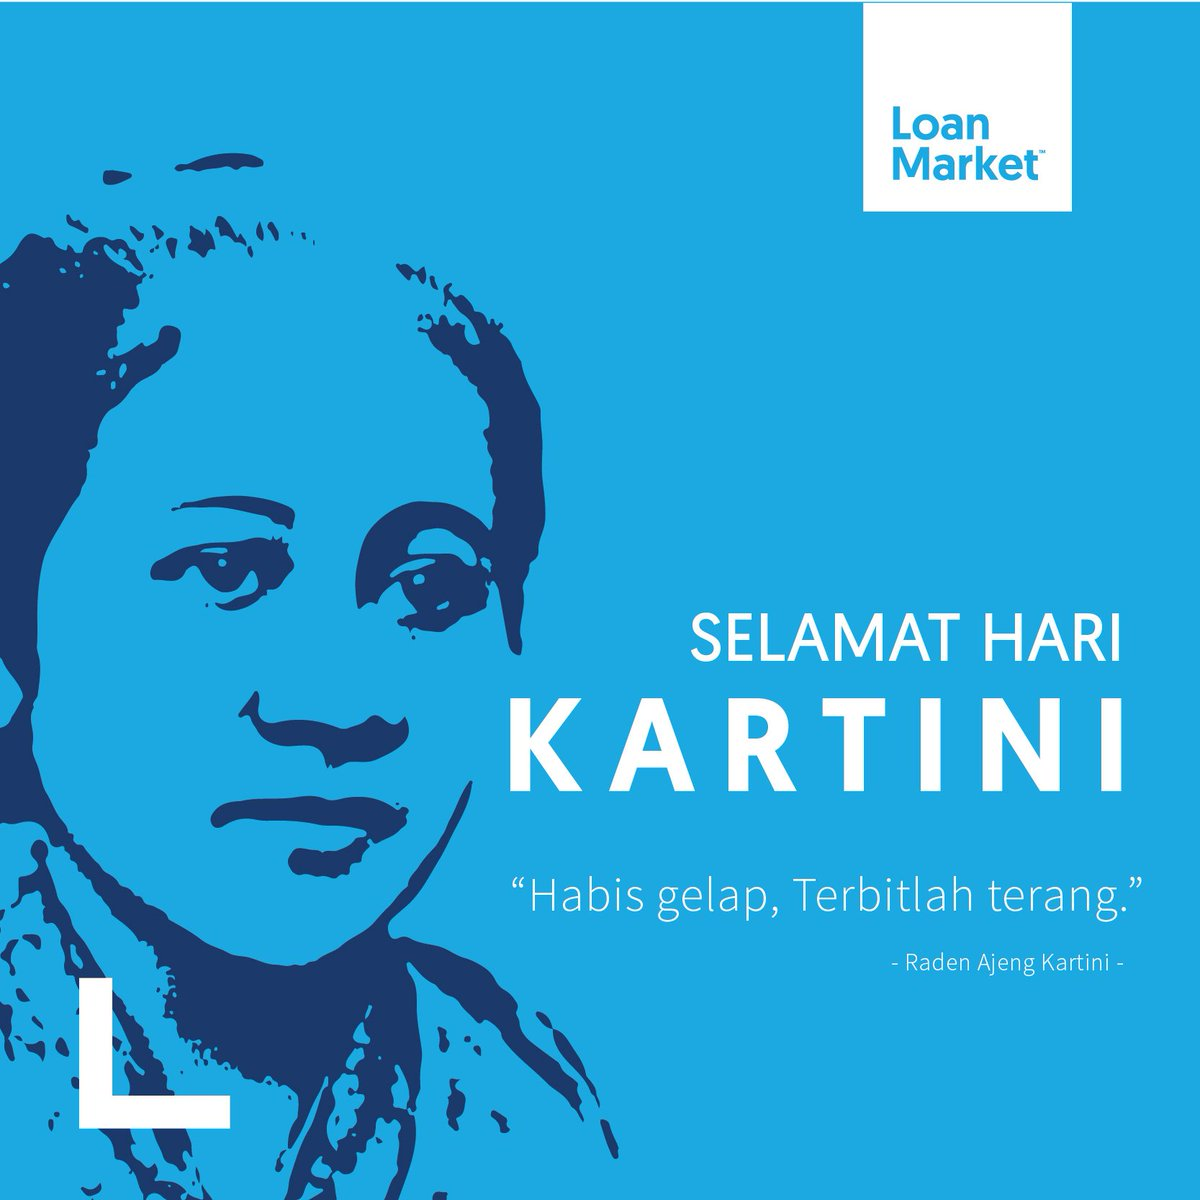 "Selamat Hari Kartini to all Indonesian Women! ""Habis Gelap Terbitlah Terang"". - R. A. Kartini 21 April 2018   #loanmarketindonesia #loanmarket #loanadviser #together #pinjaman #kpr  #modalusaha #bisnis #pengusaha #business #teamwork #april2018 #kartini #woman #eventpic.twitter.com/mqKb3ayz6t"